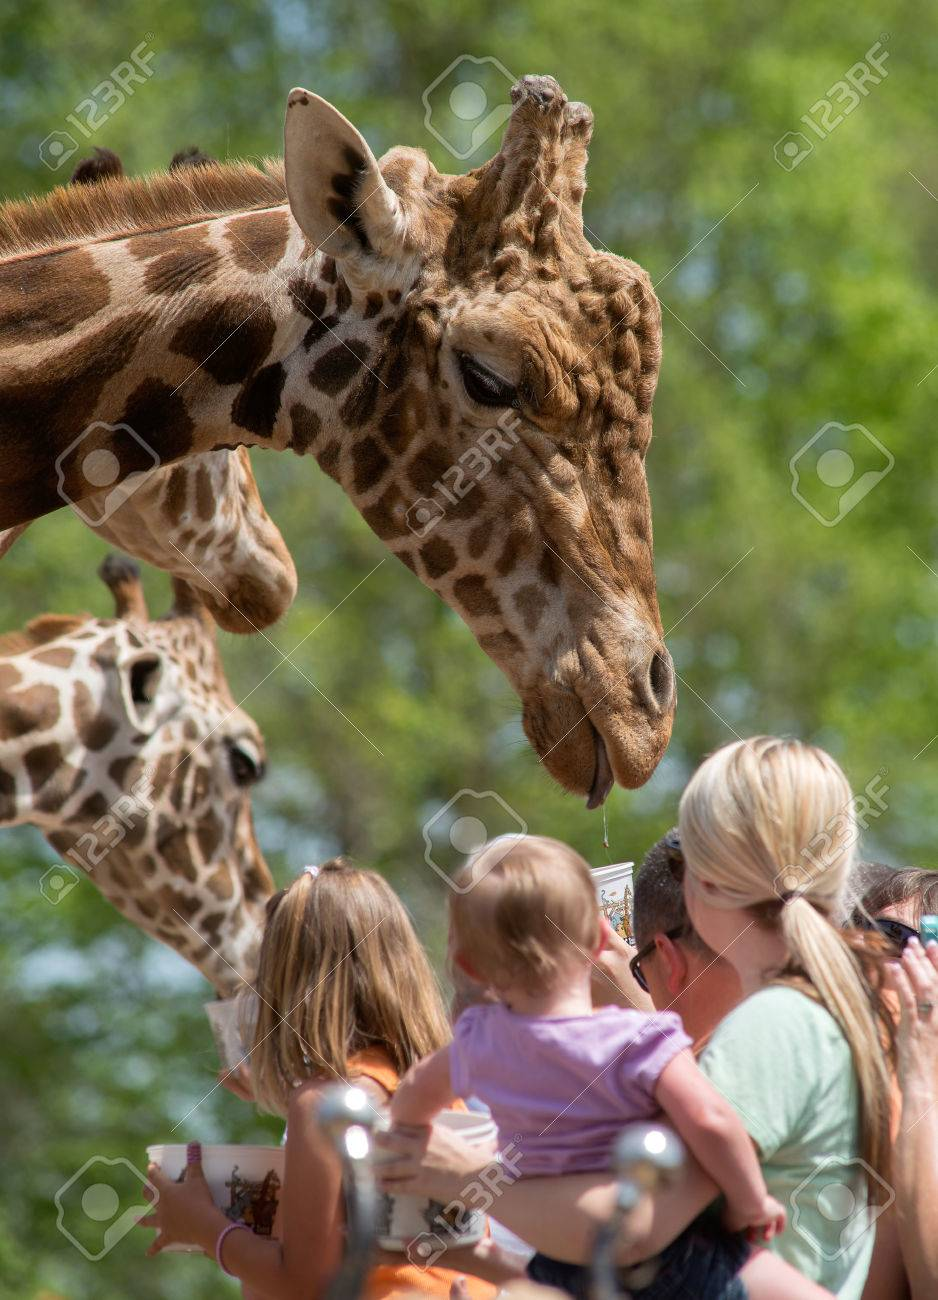 A crowd of people feeding a large male Giraffe Stock Photo - 27957046